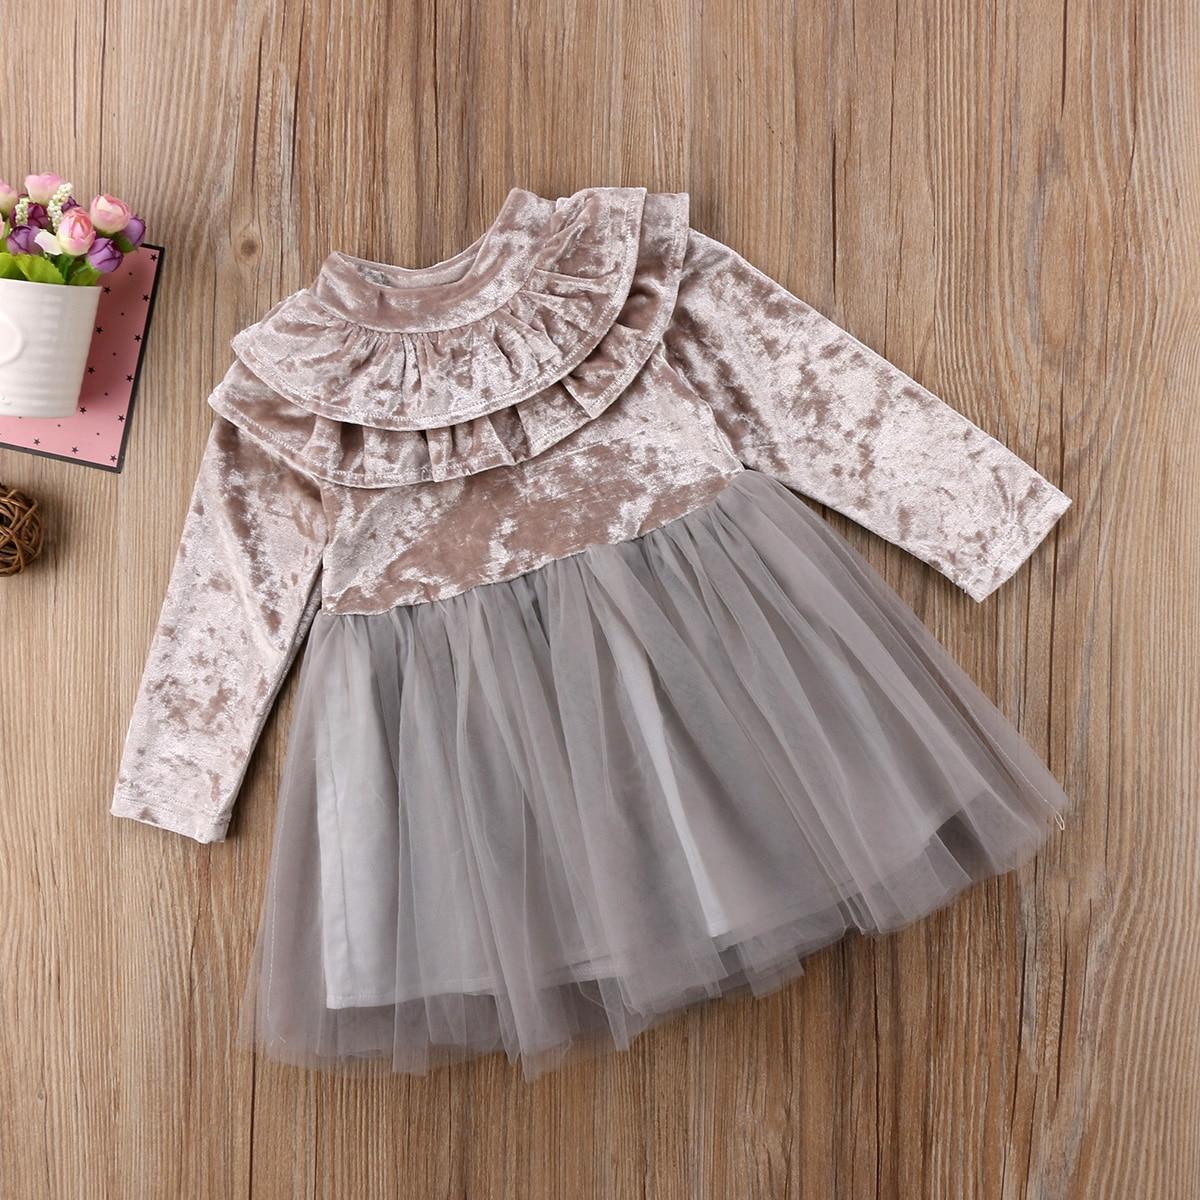 Princess Kids Baby Girls Dress Velvet Fleece Party Dress Ruffle Tulle Tutu Dress